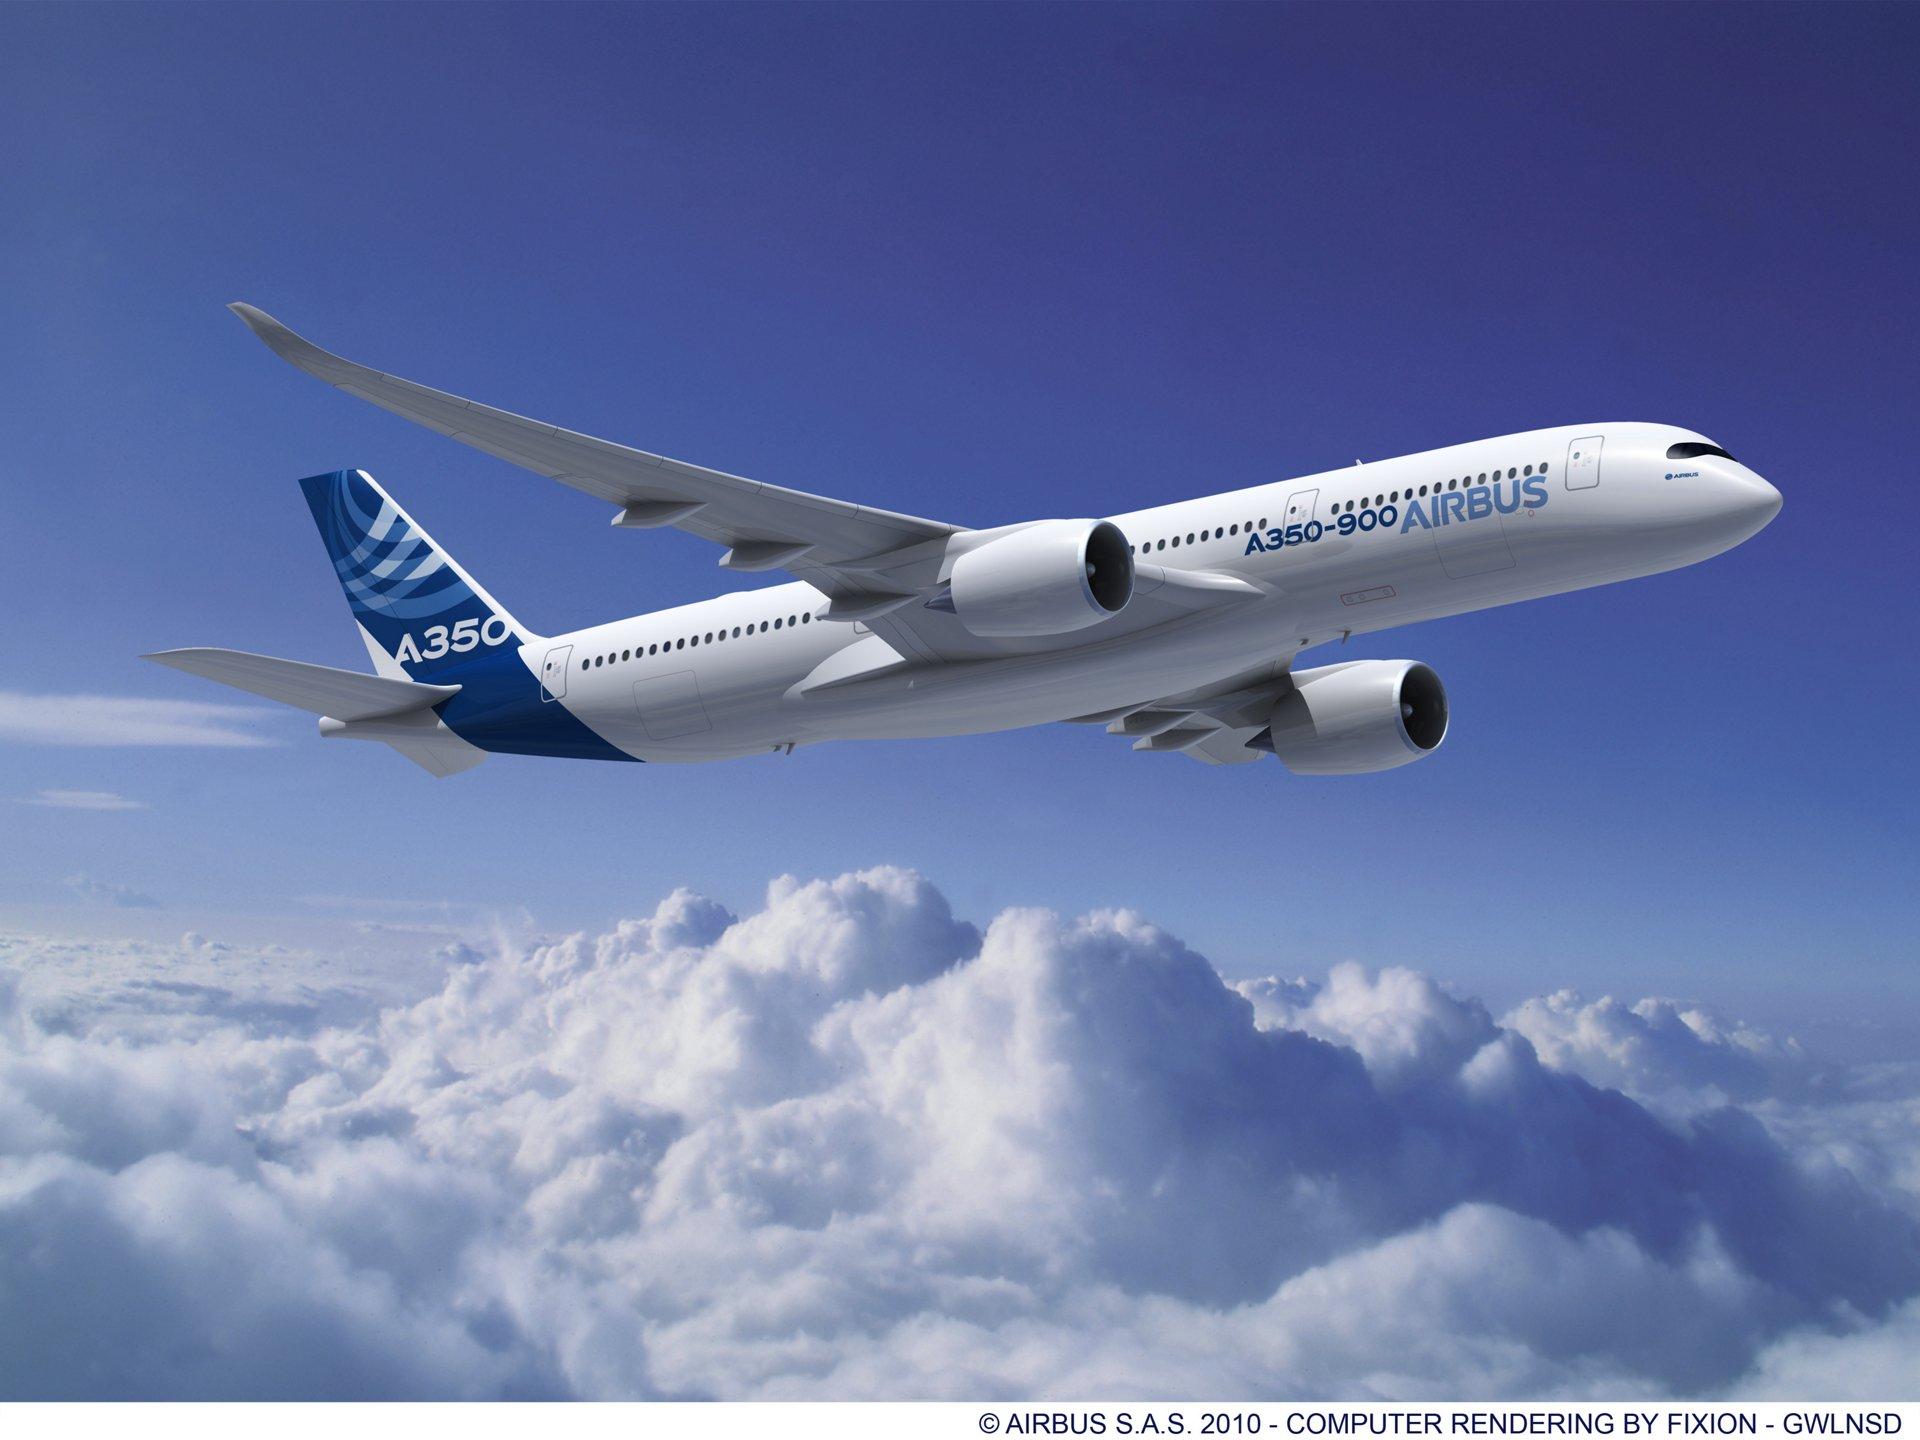 A350-900 RR AIRBUS V10 300dpi